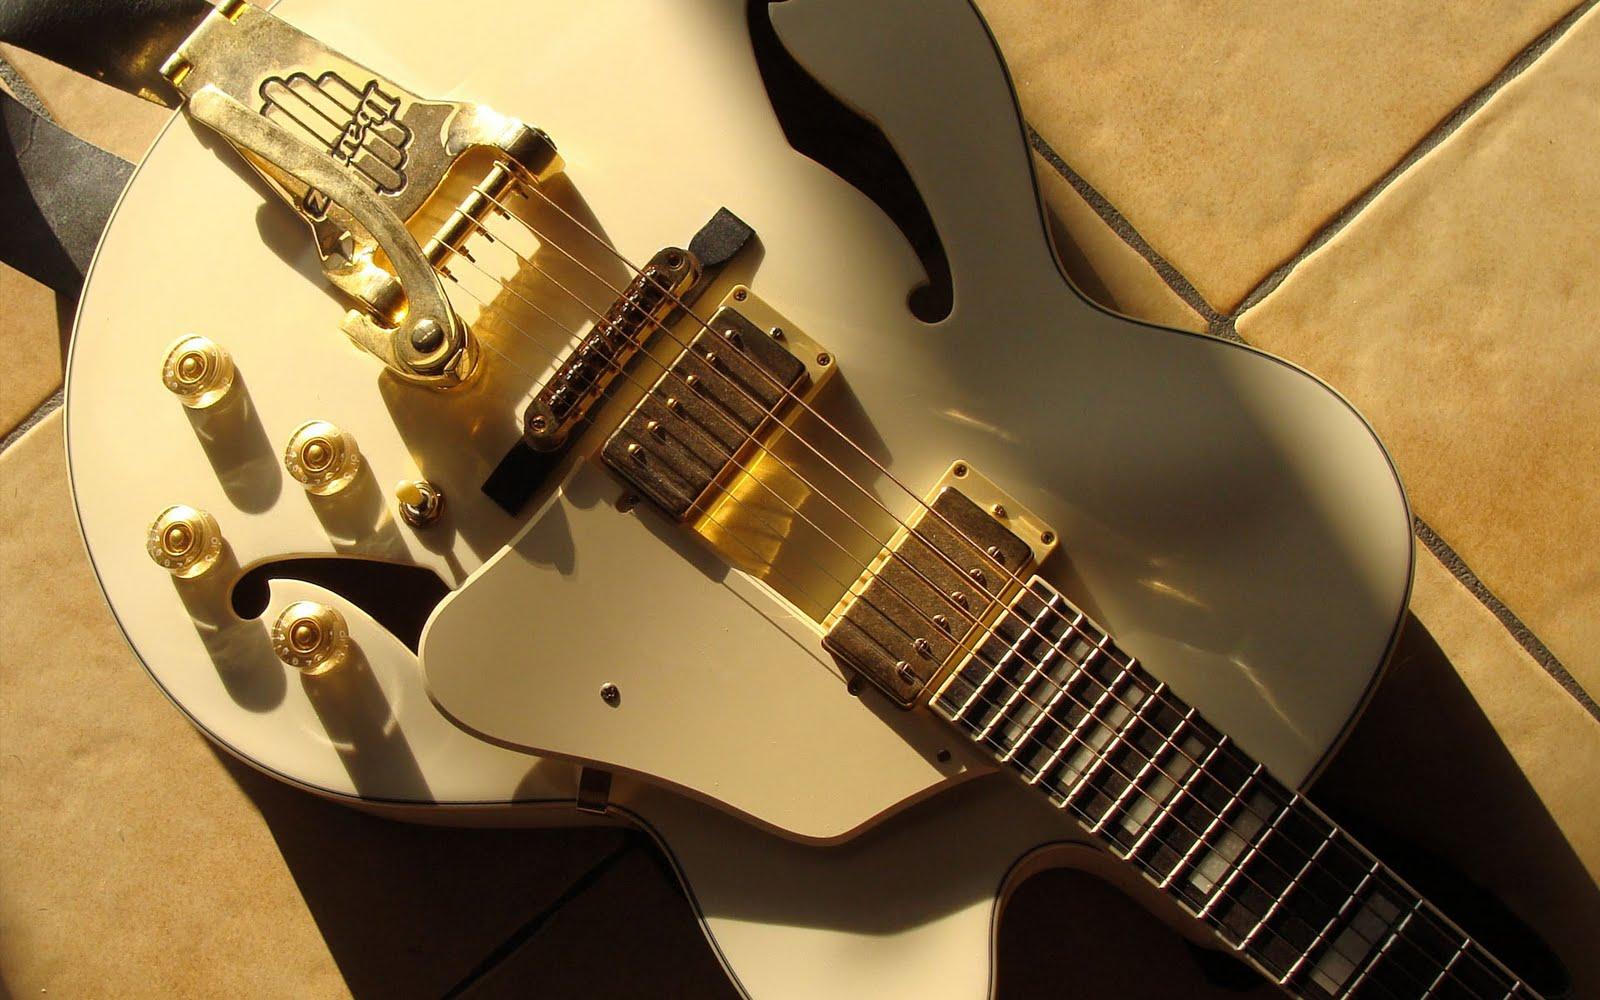 guitar ibanez wallpaper hd background guitar ibanez hd wallpaper 1600x1000